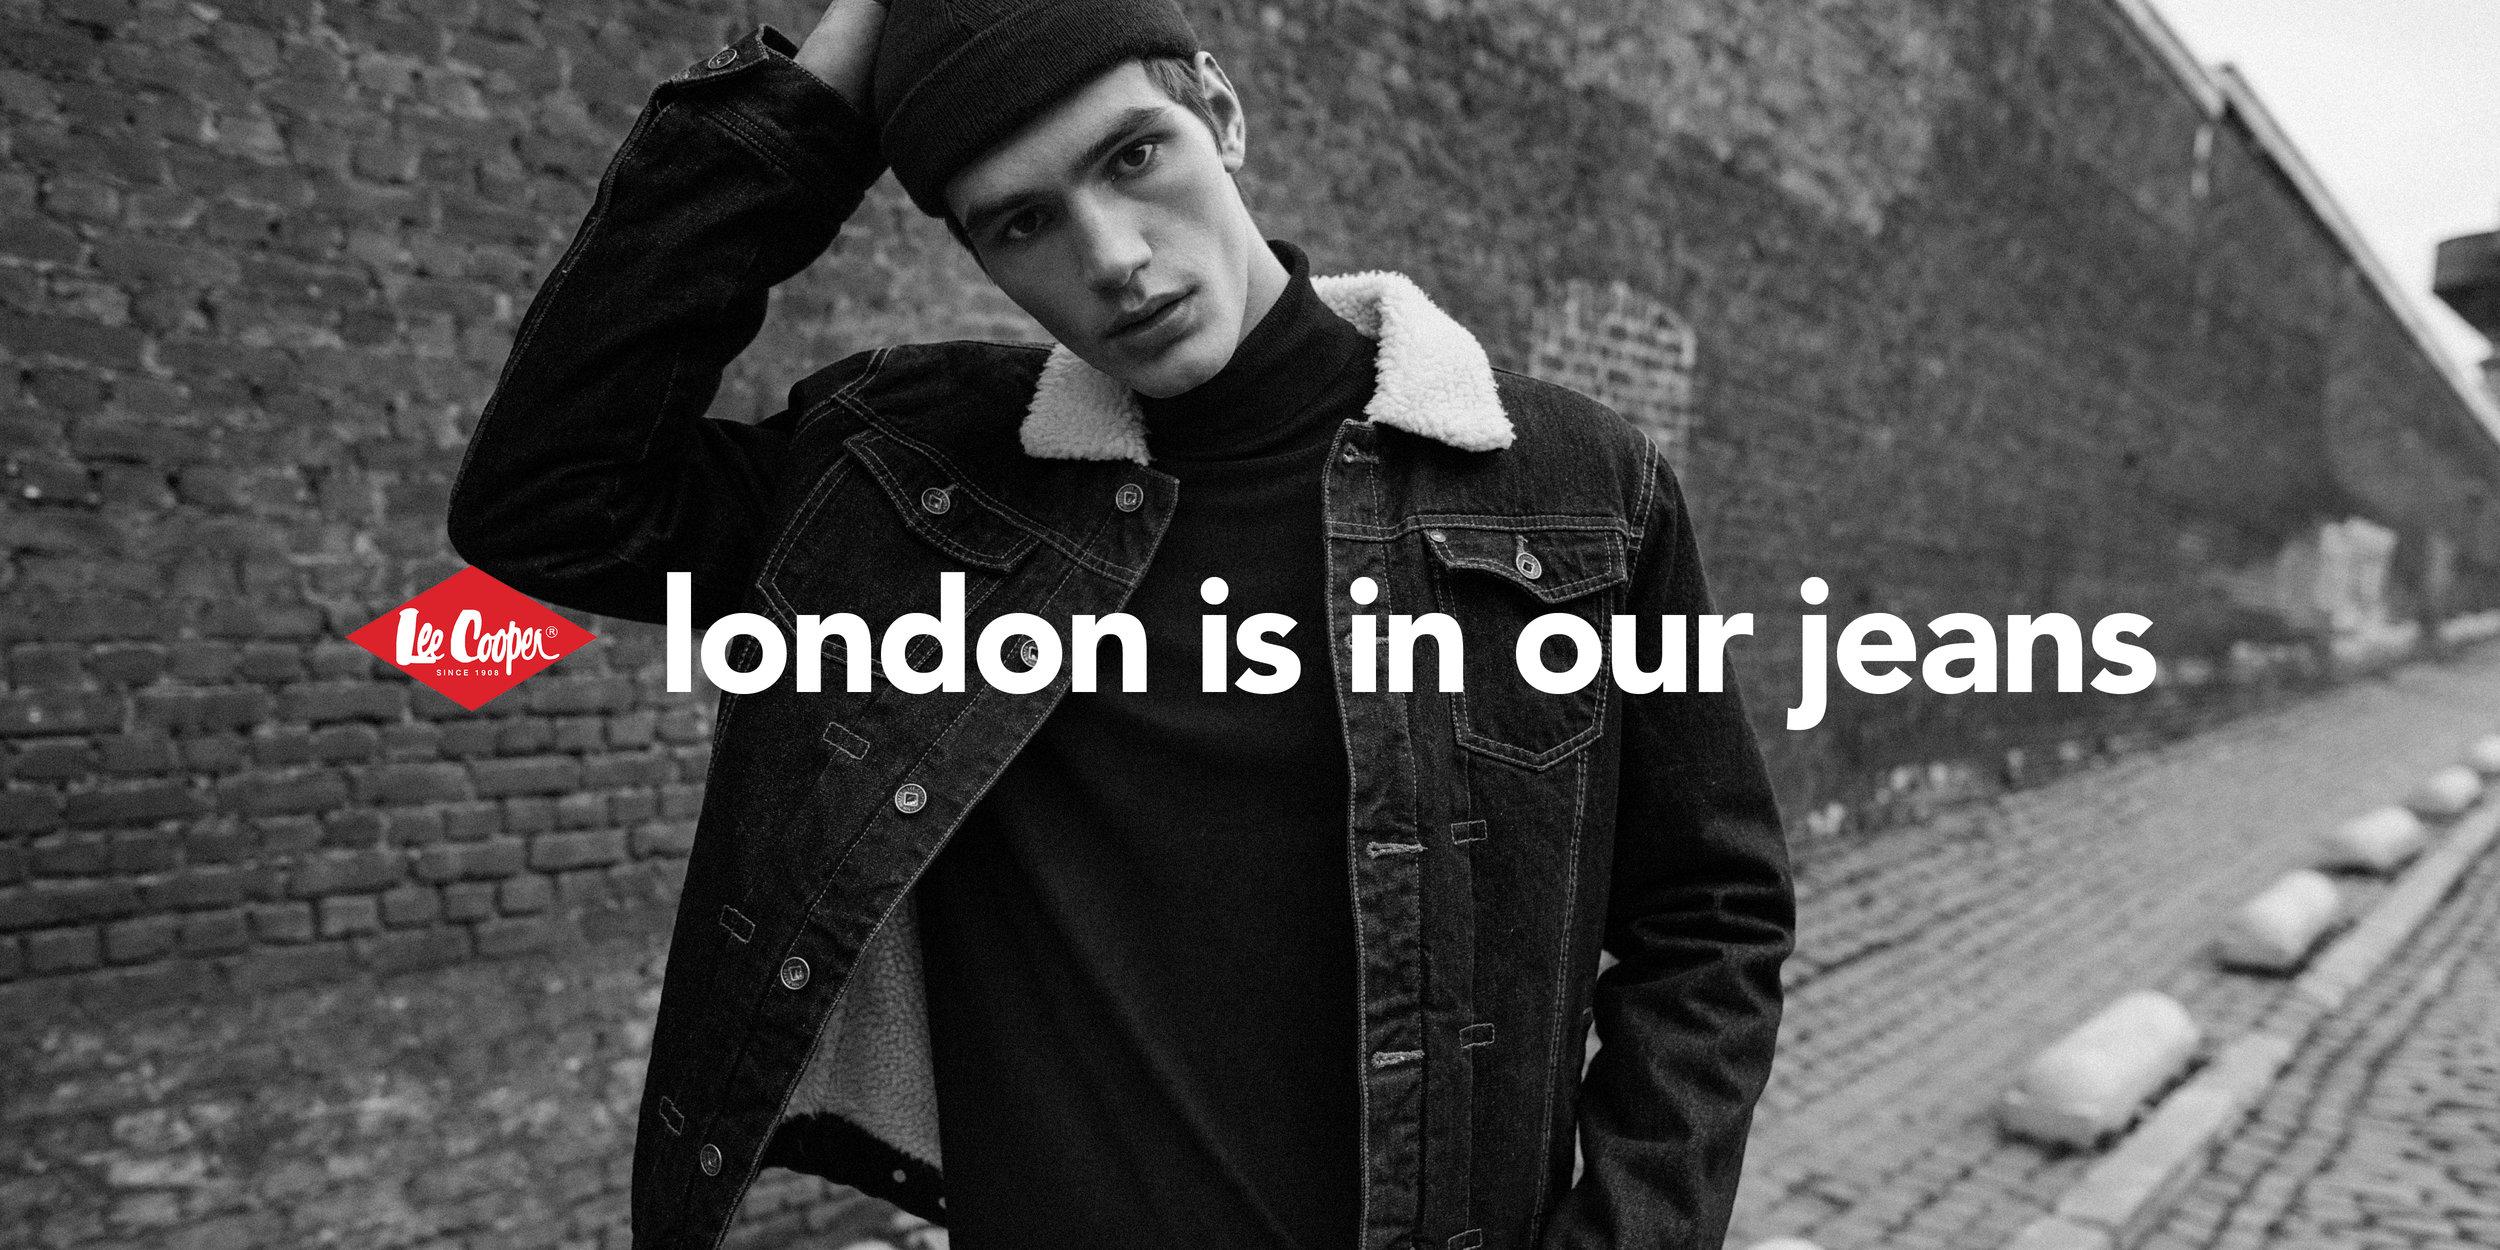 Londonisinourjeans.jpg